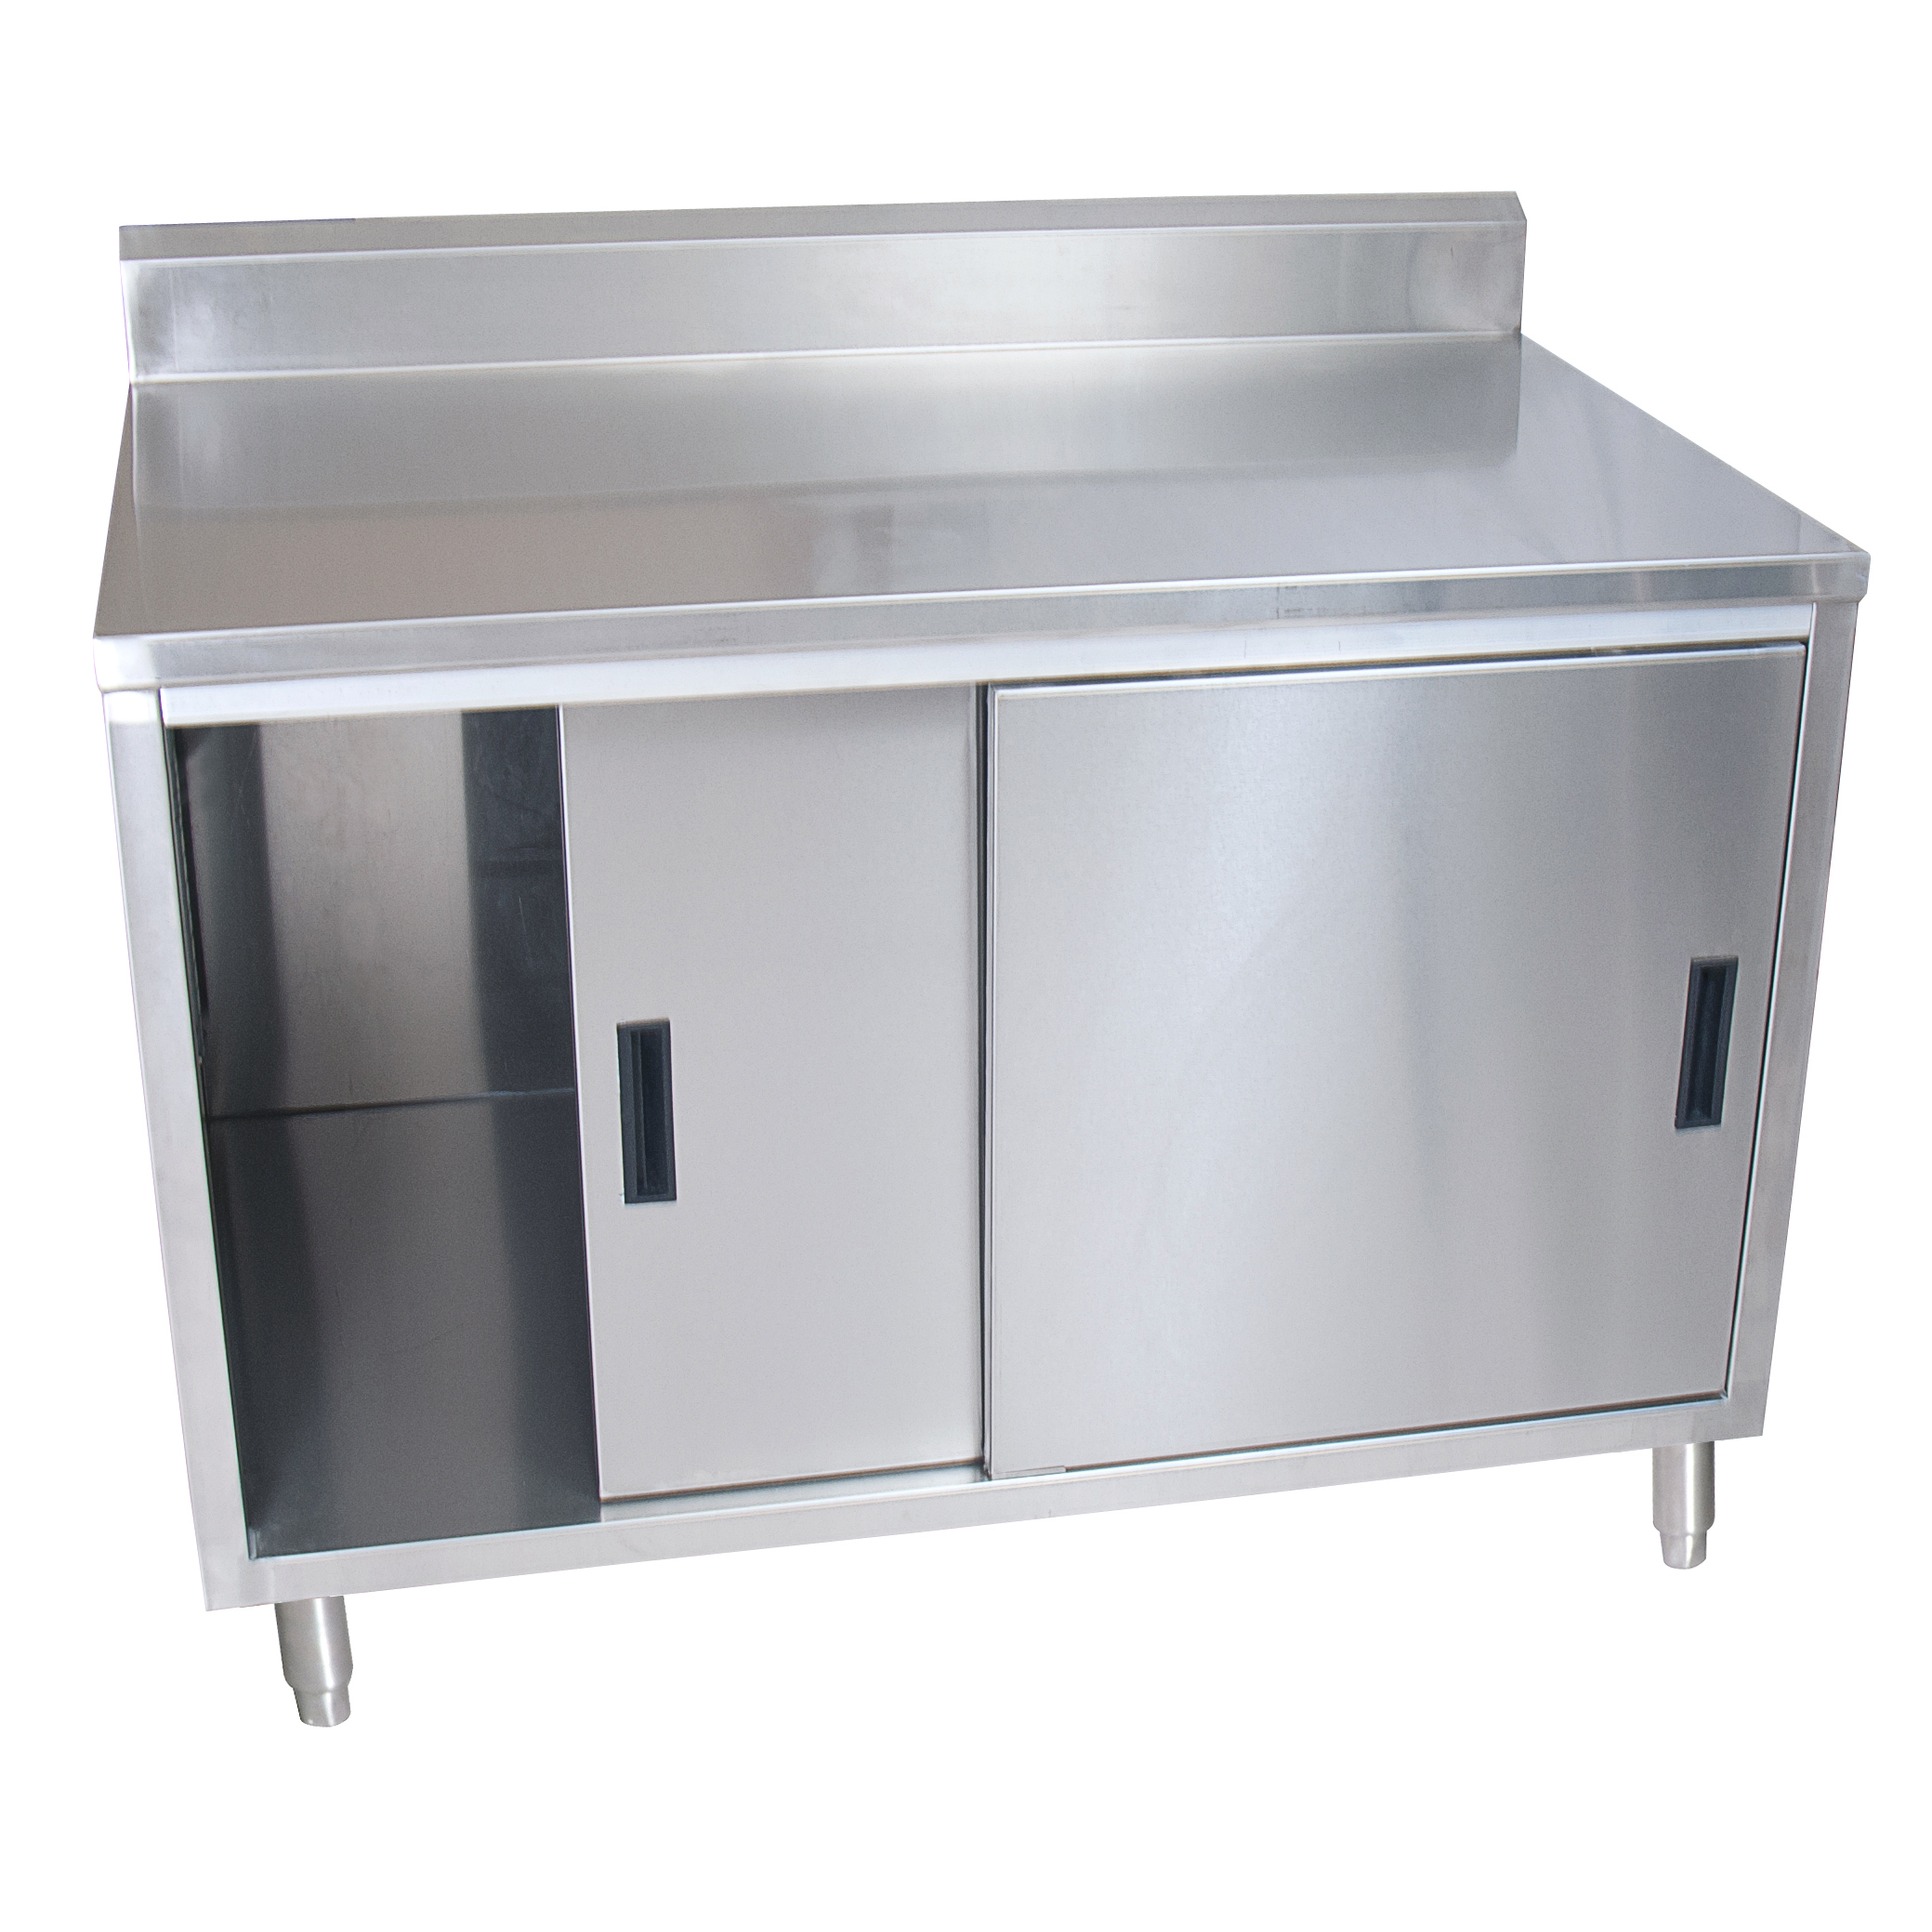 BK Resources BKDCR5-3660S work table, cabinet base sliding doors